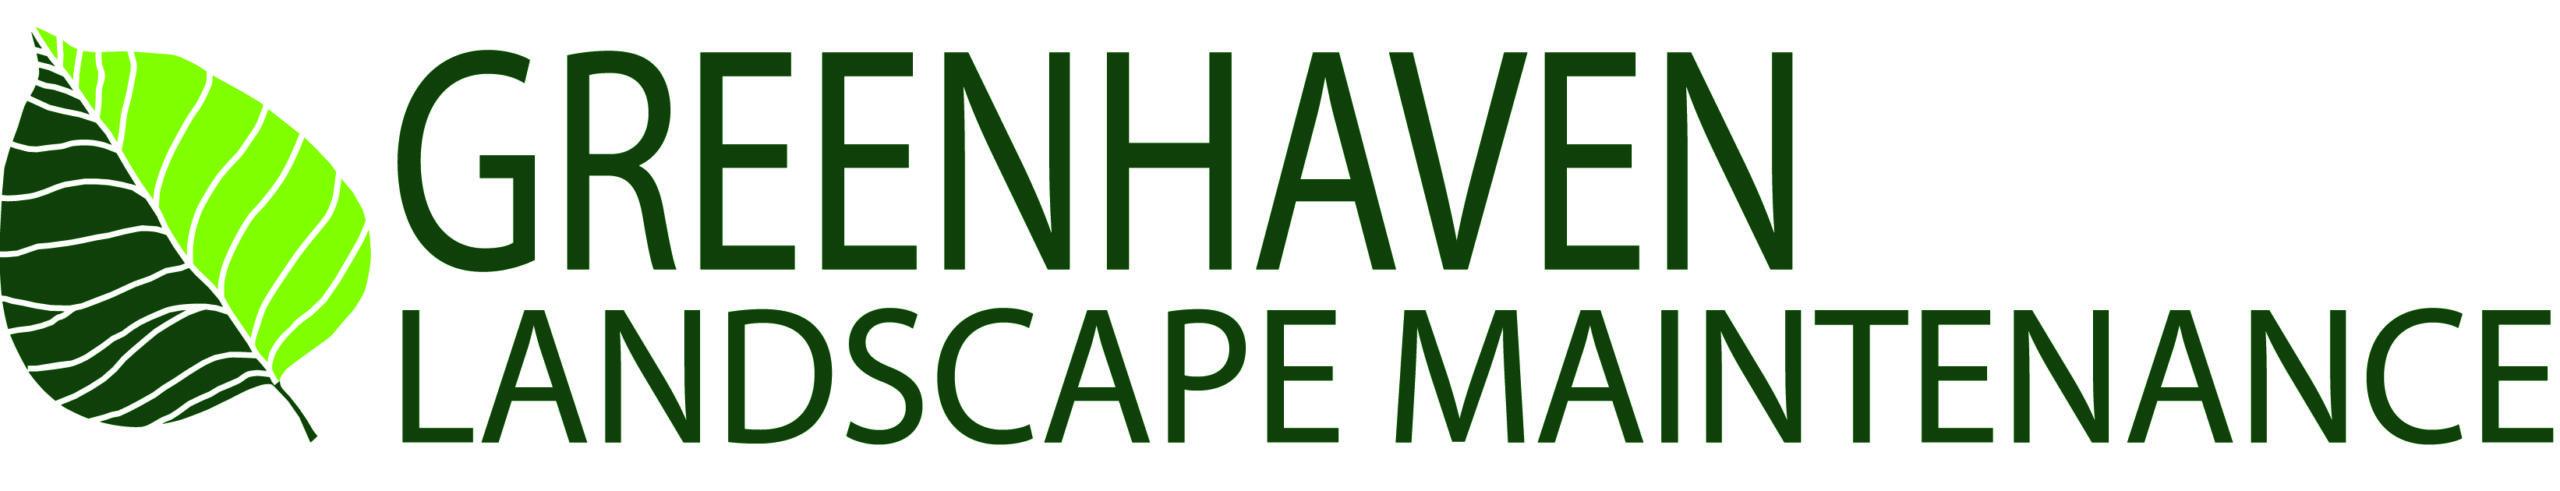 Greenhaven Landscape Maintenance